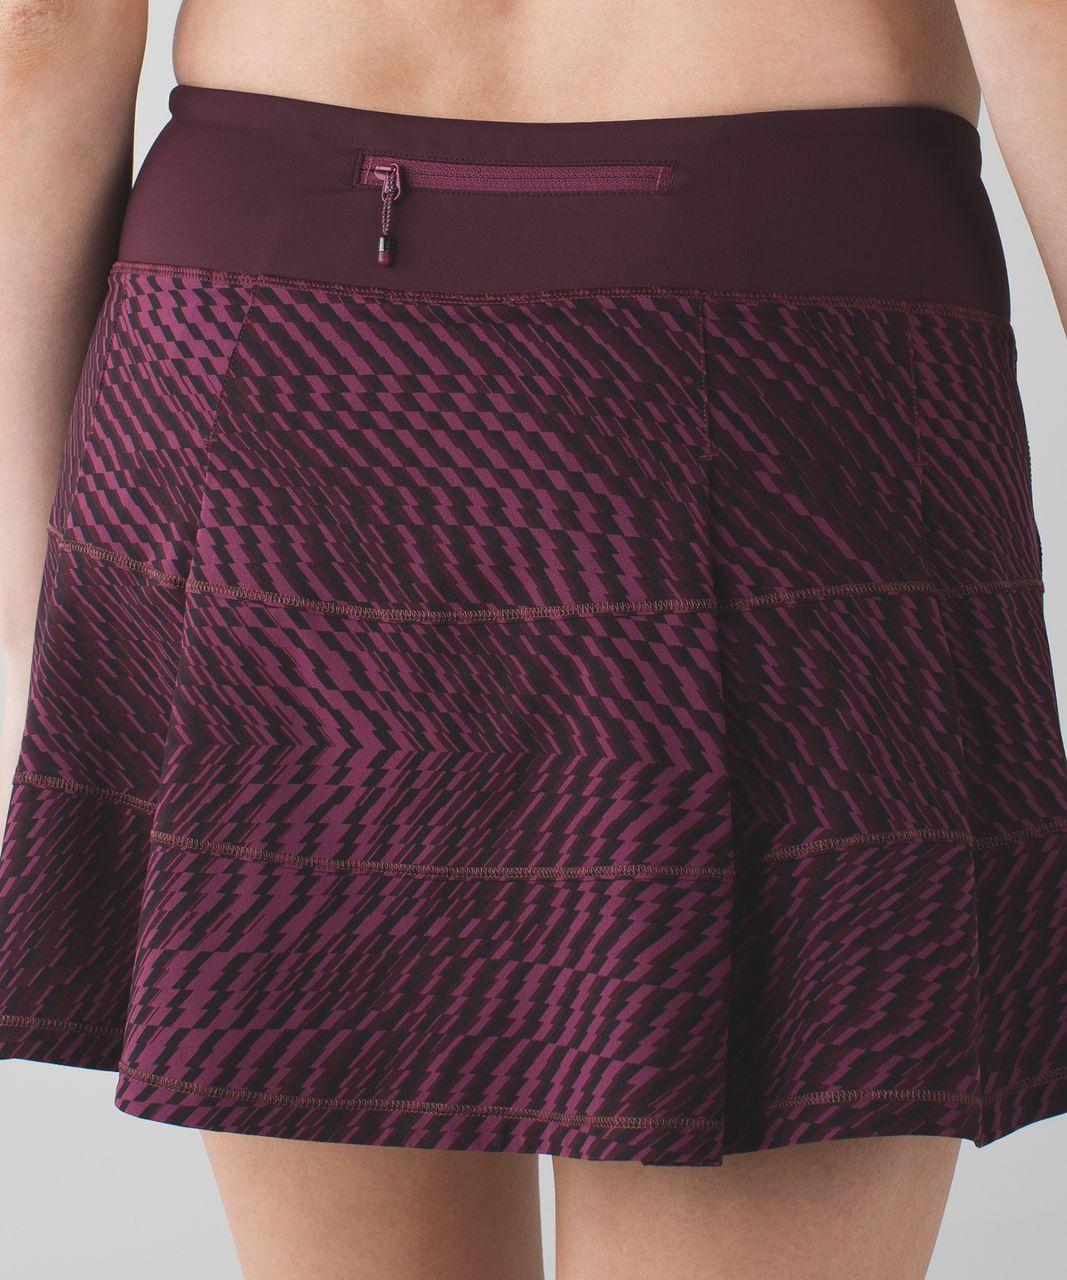 Lululemon Pace Rival Skirt II (Tall) - Shifted Horizon Red Grape Black / Bordeaux Drama